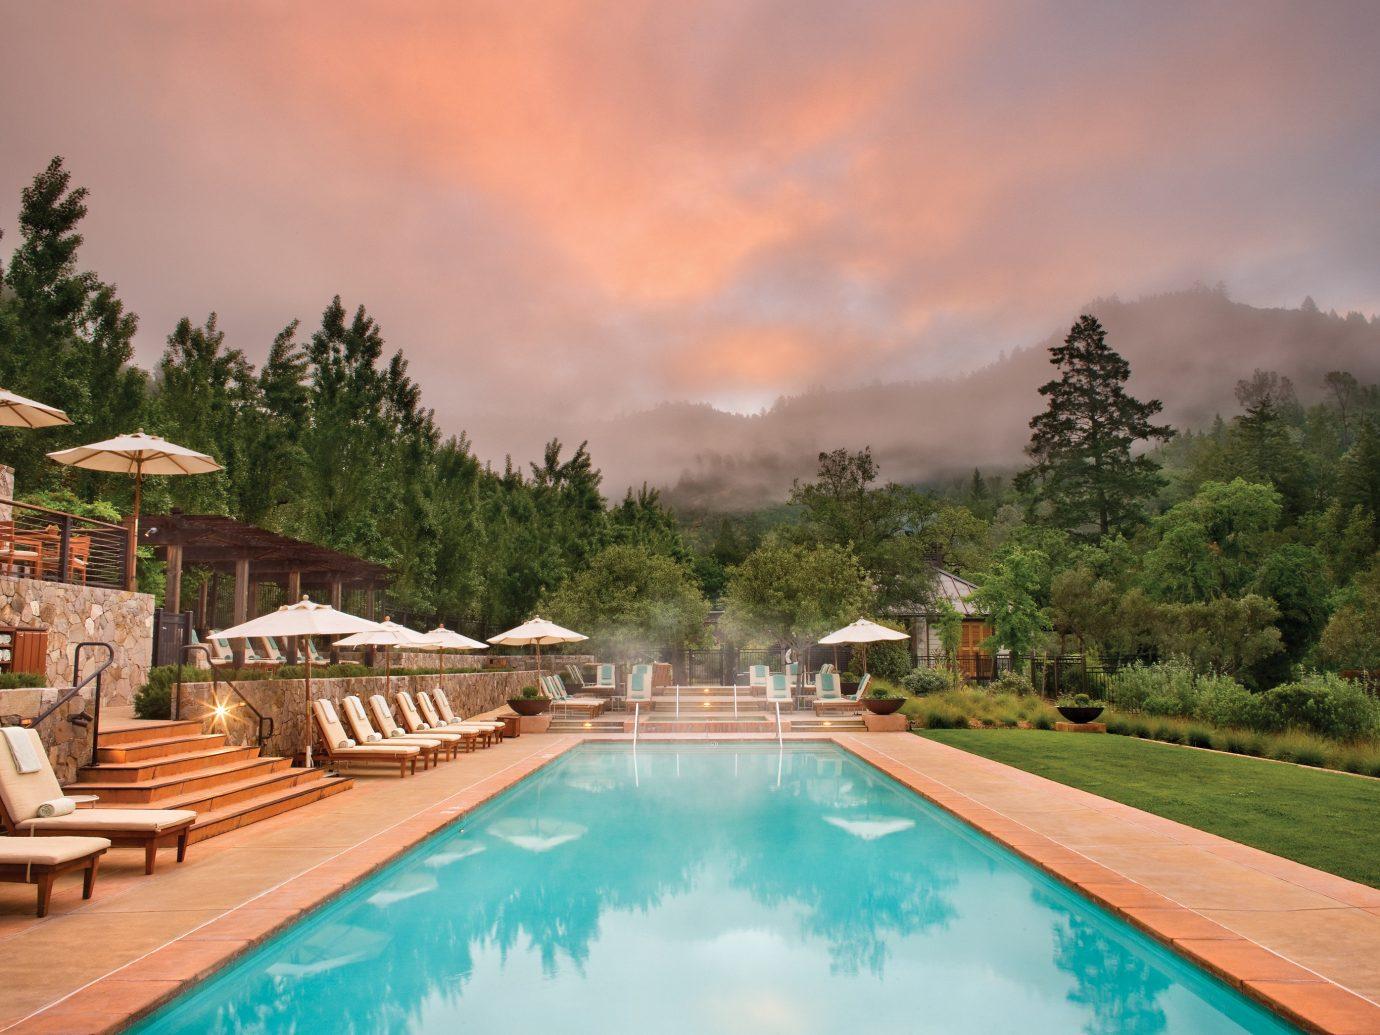 Eco Food + Drink Health + Wellness Hotels Luxury Outdoors Pool Ranch Romance Romantic Rustic Scenic views Spa Retreats Wellness tree swimming pool Resort Villa